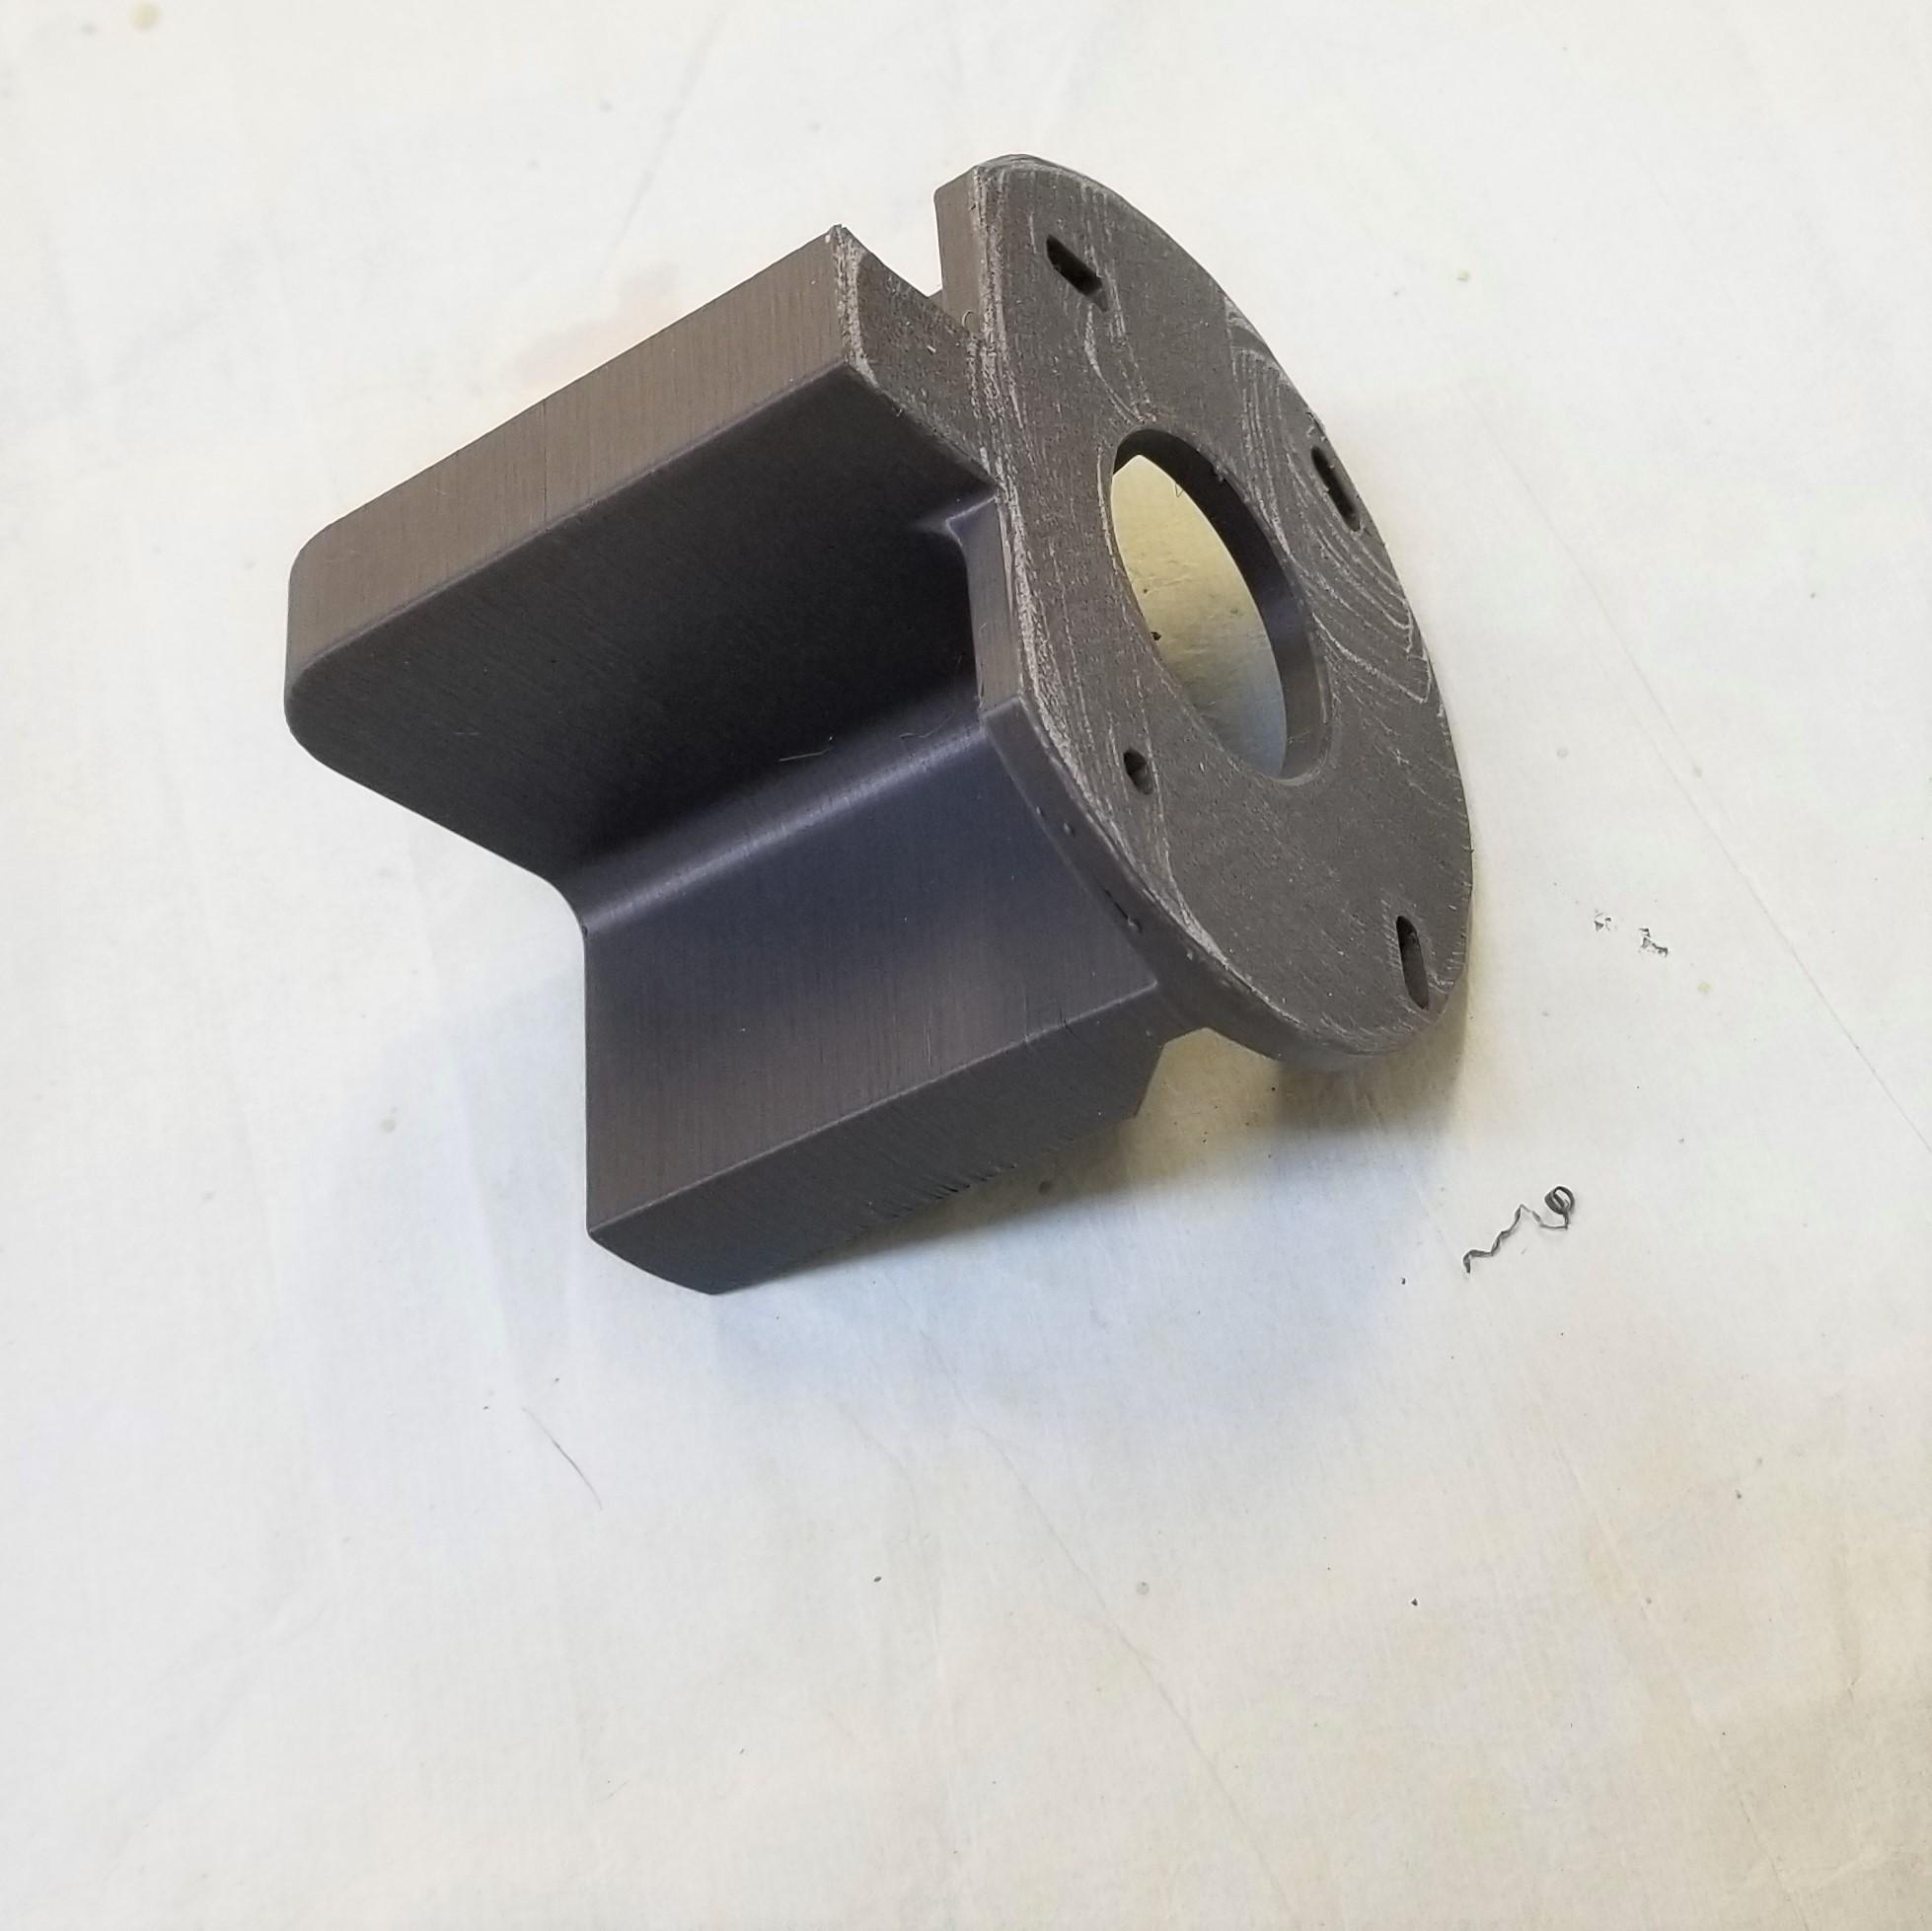 20191012_191827.jpg Download free STL file Makita banding trim attachment • 3D printing design, jimjax